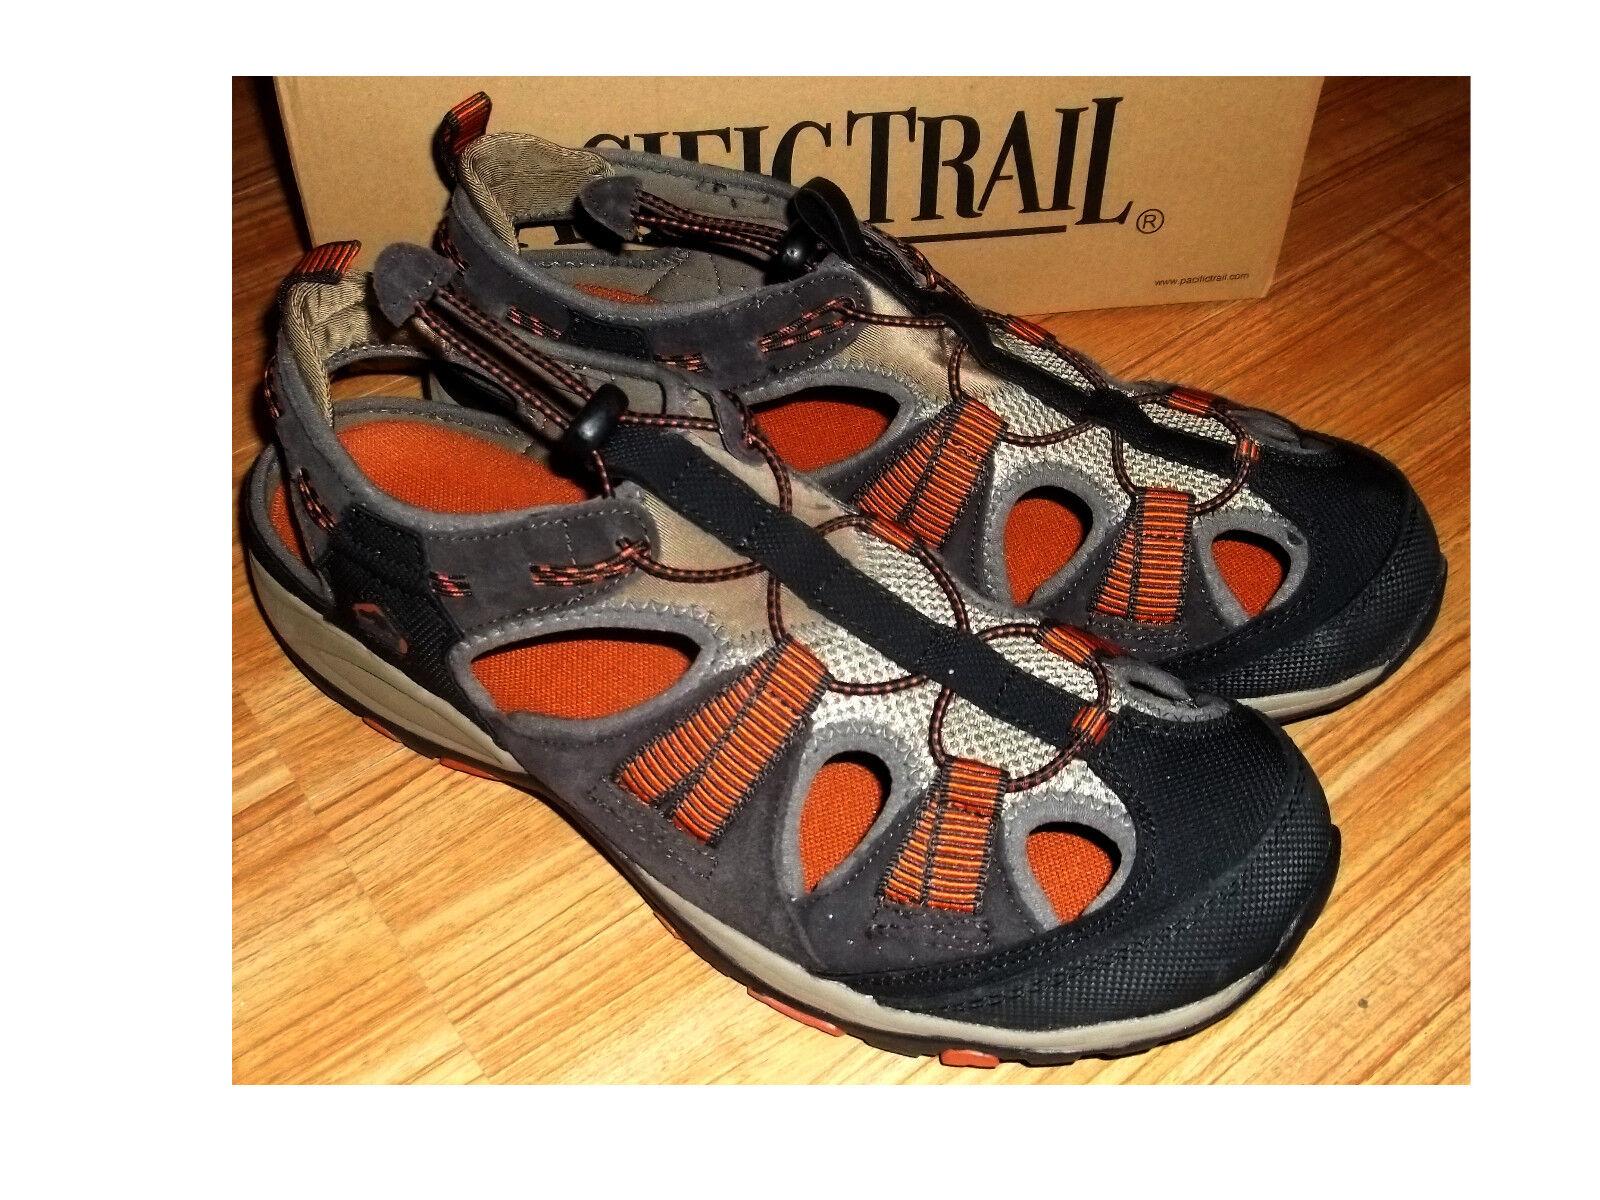 NWB PACIFIC TRAIL CHASKI Hiking Casual Sandals Sz 13 FREESHIPPING